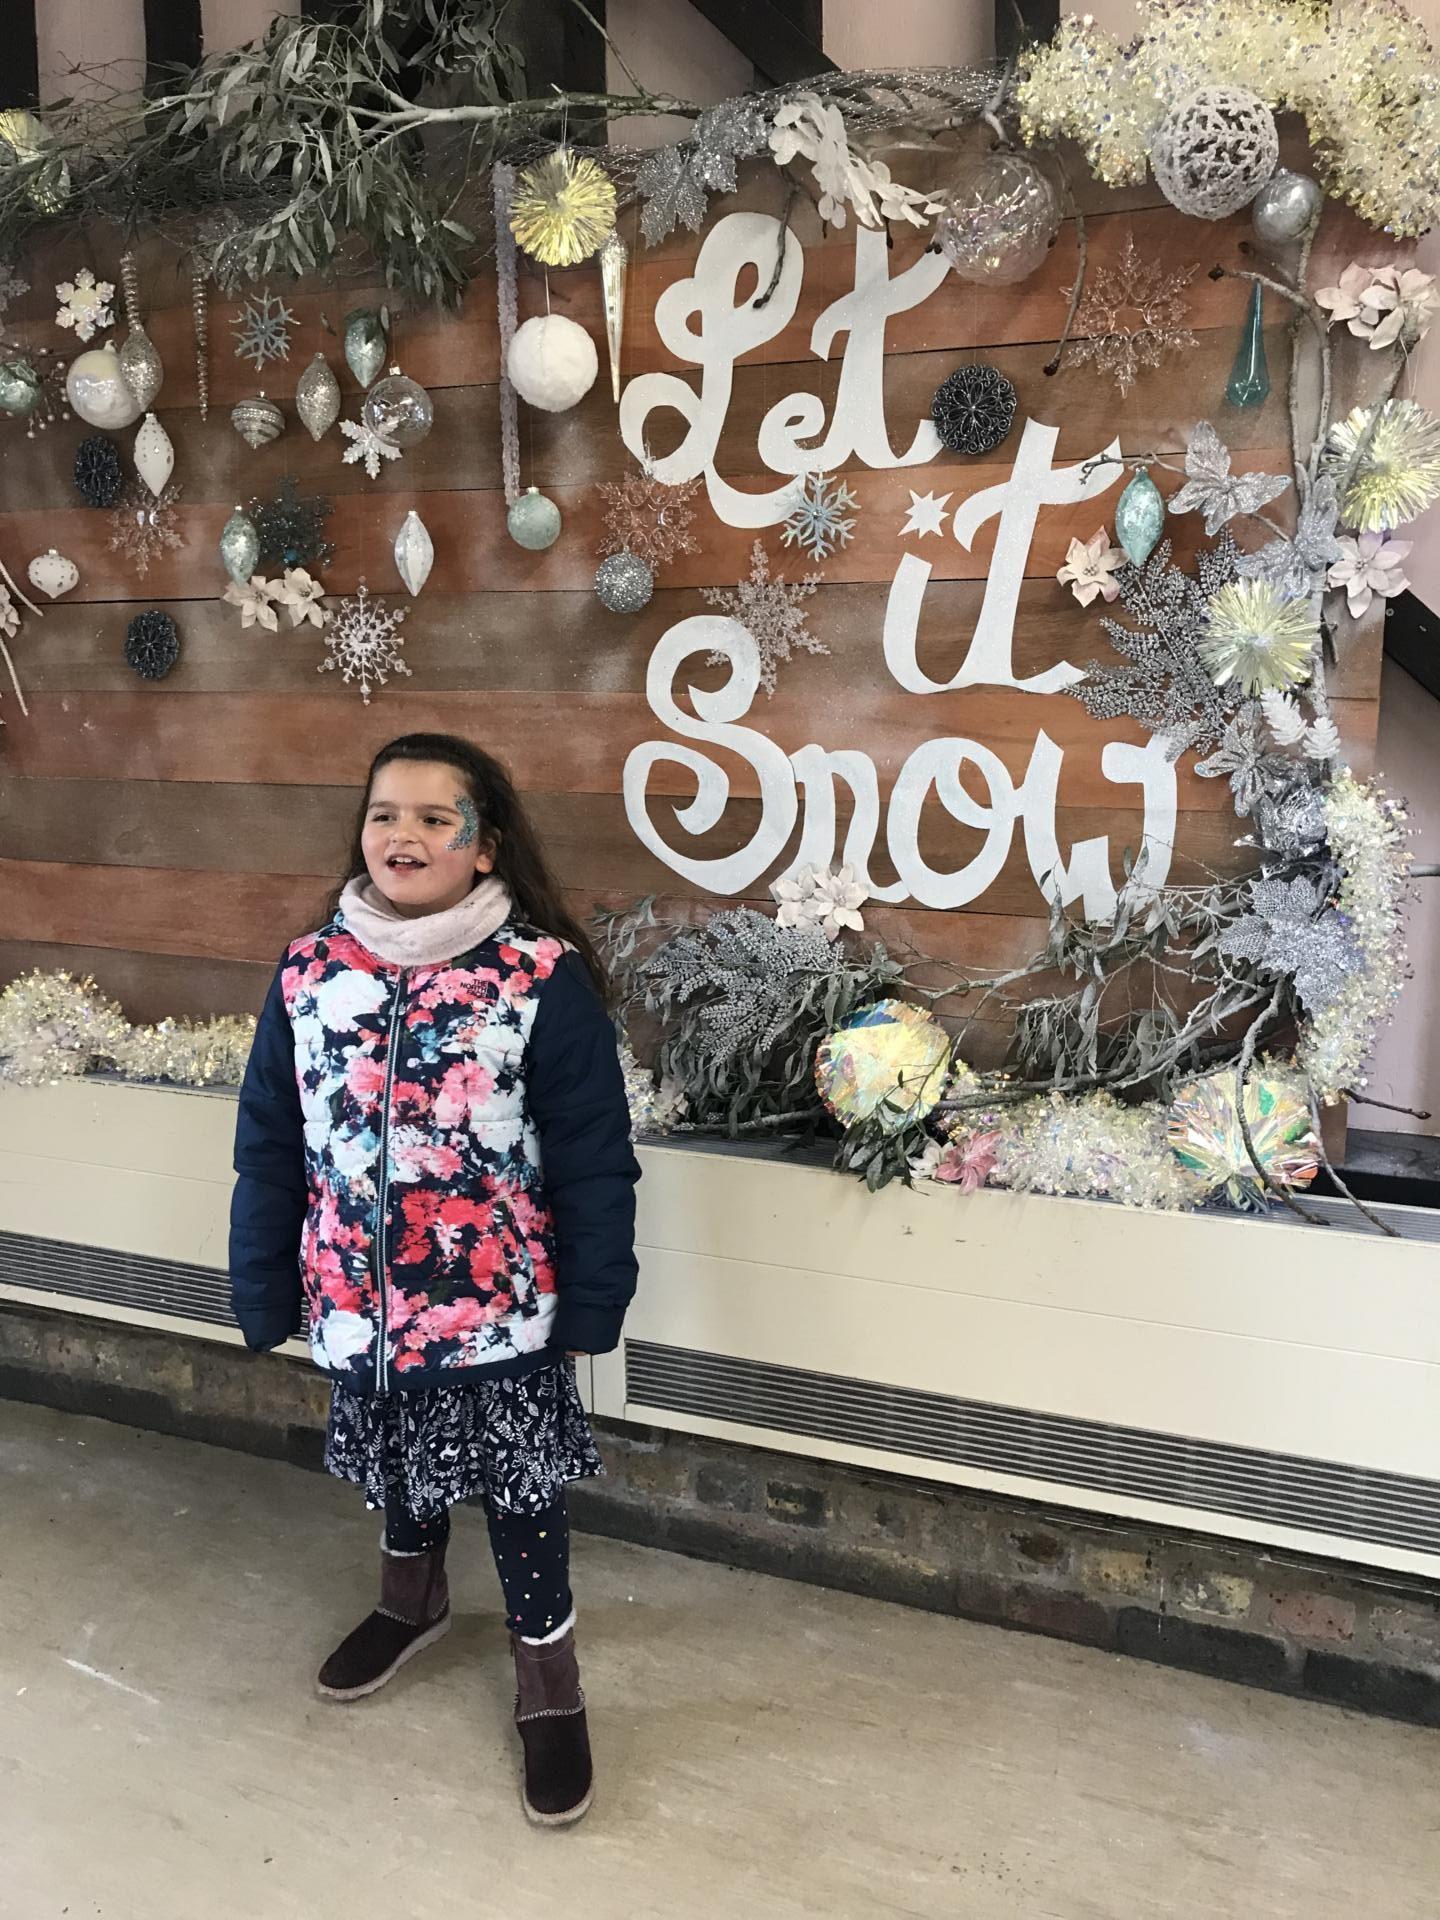 Let it Snow event at Marsh Farm, Essex